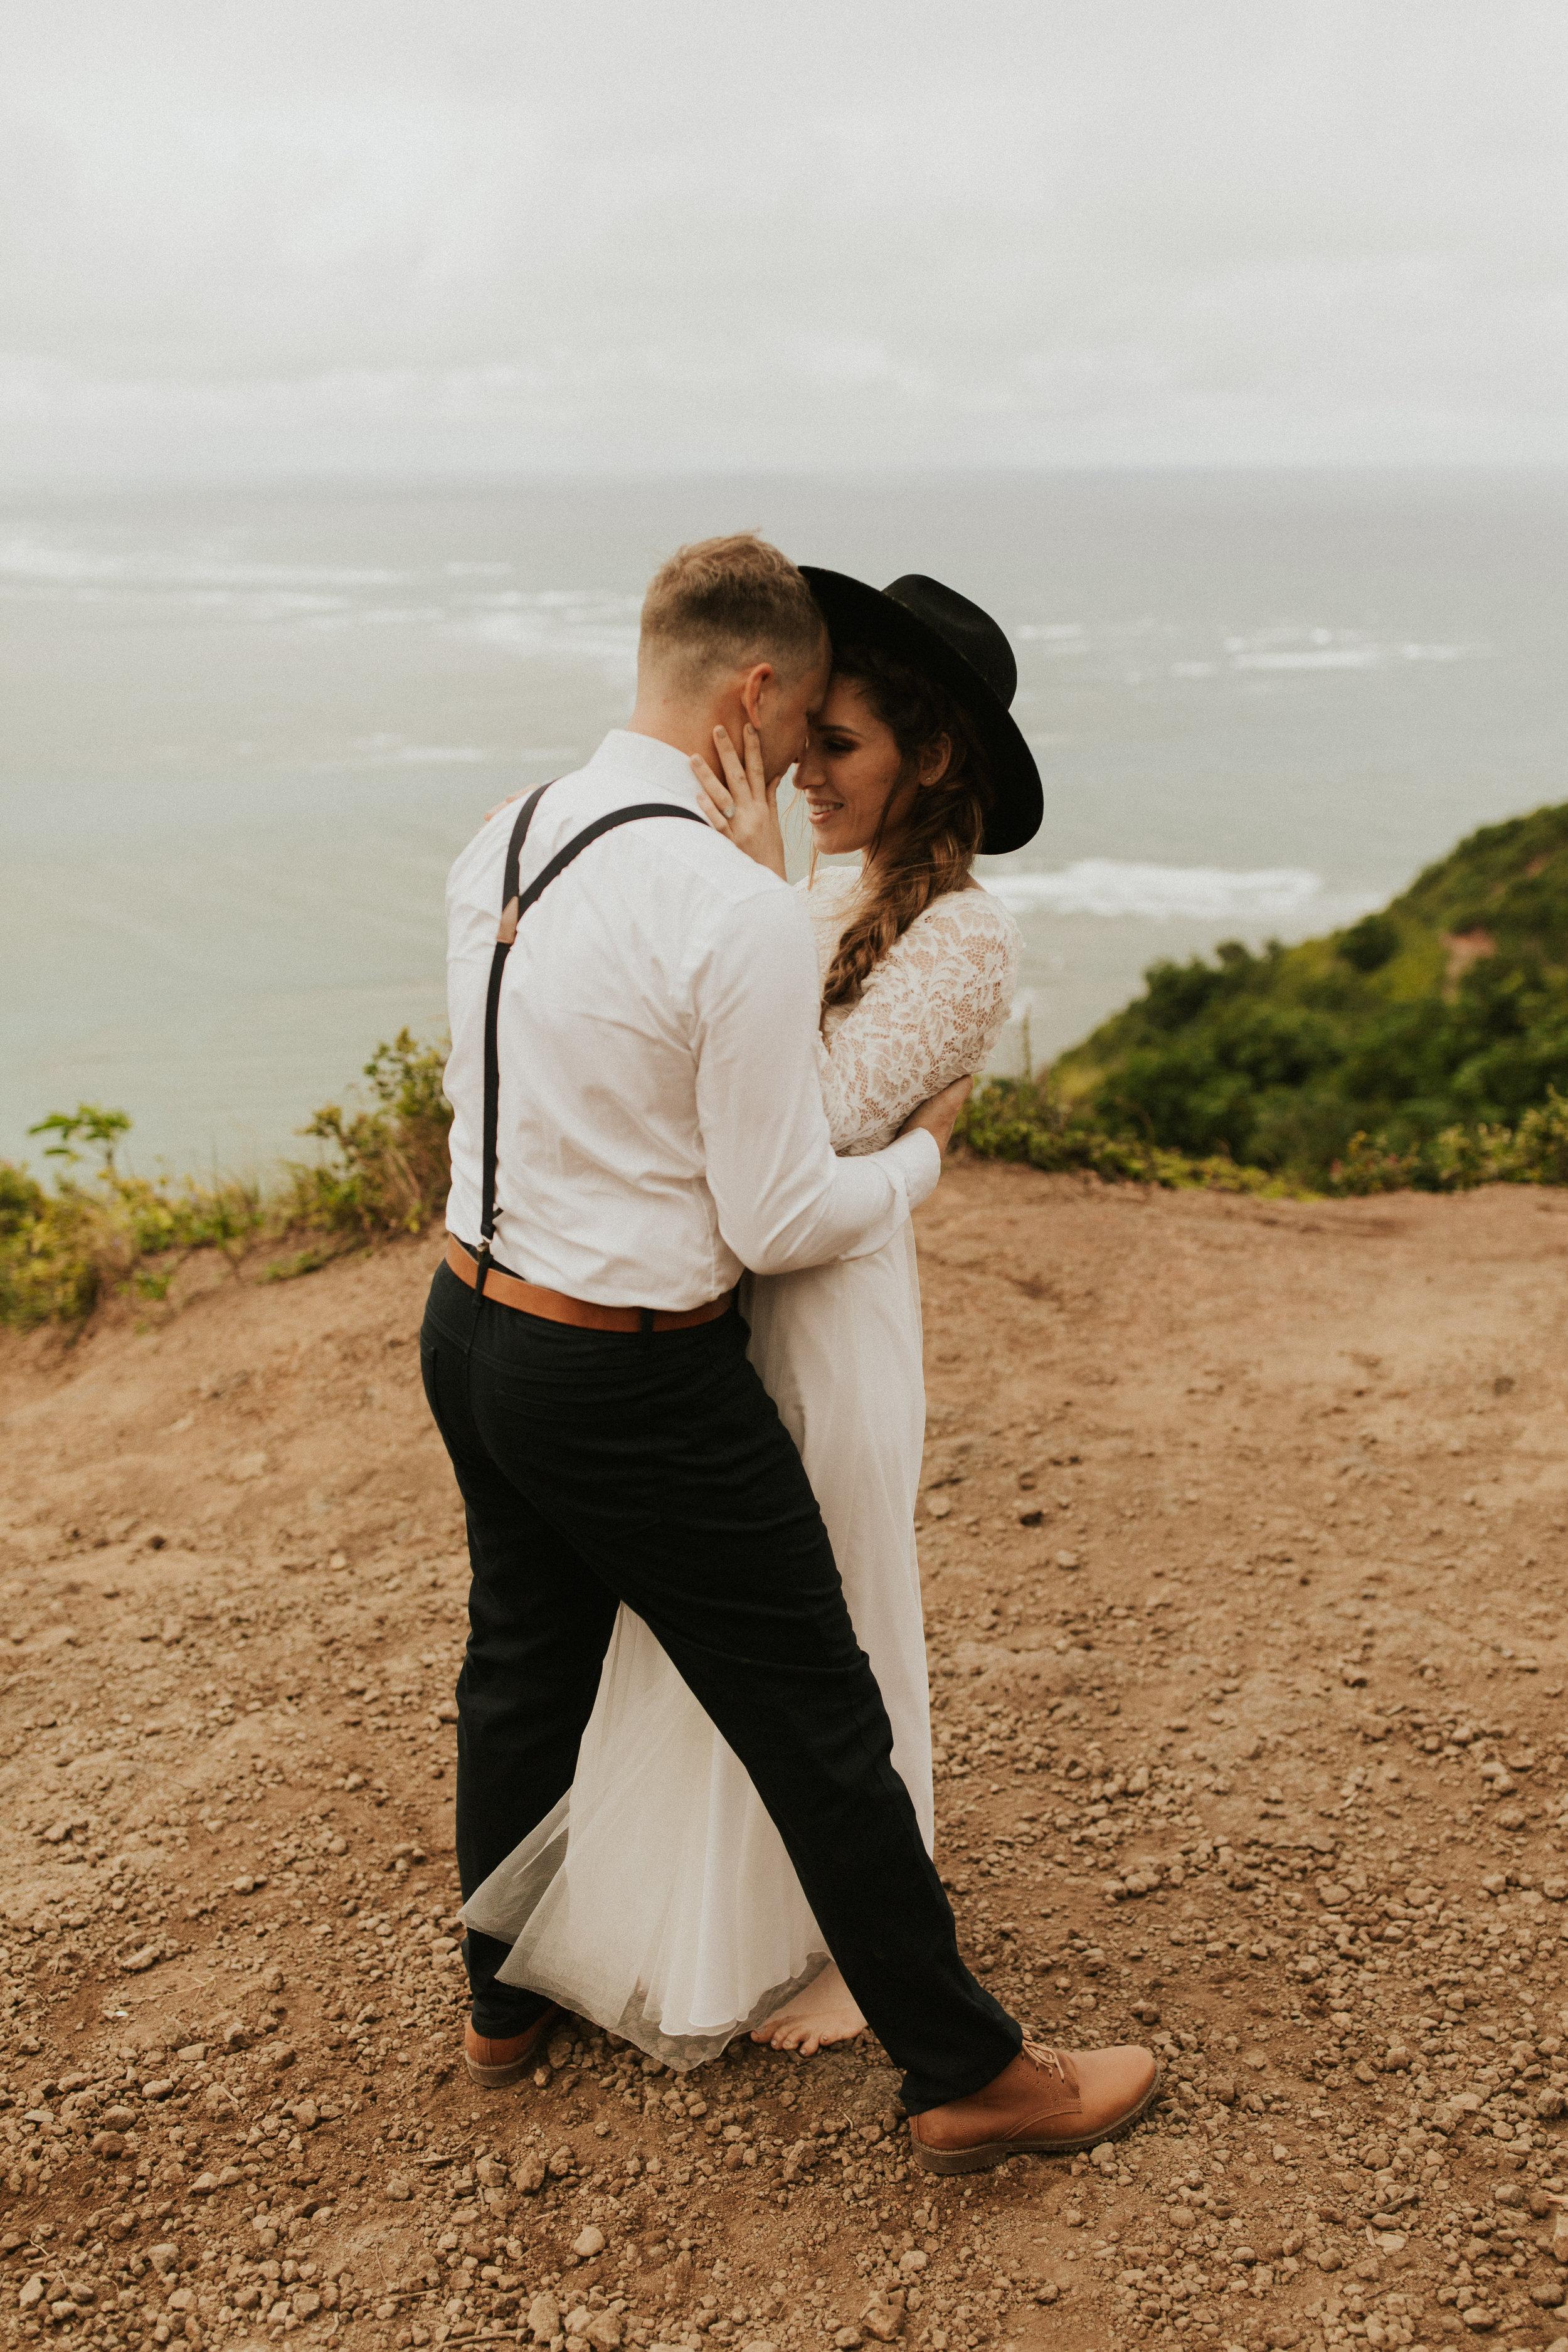 the-mclachlans-destination-elopement-photographers-mountain-hike-sena-eric-65.jpg